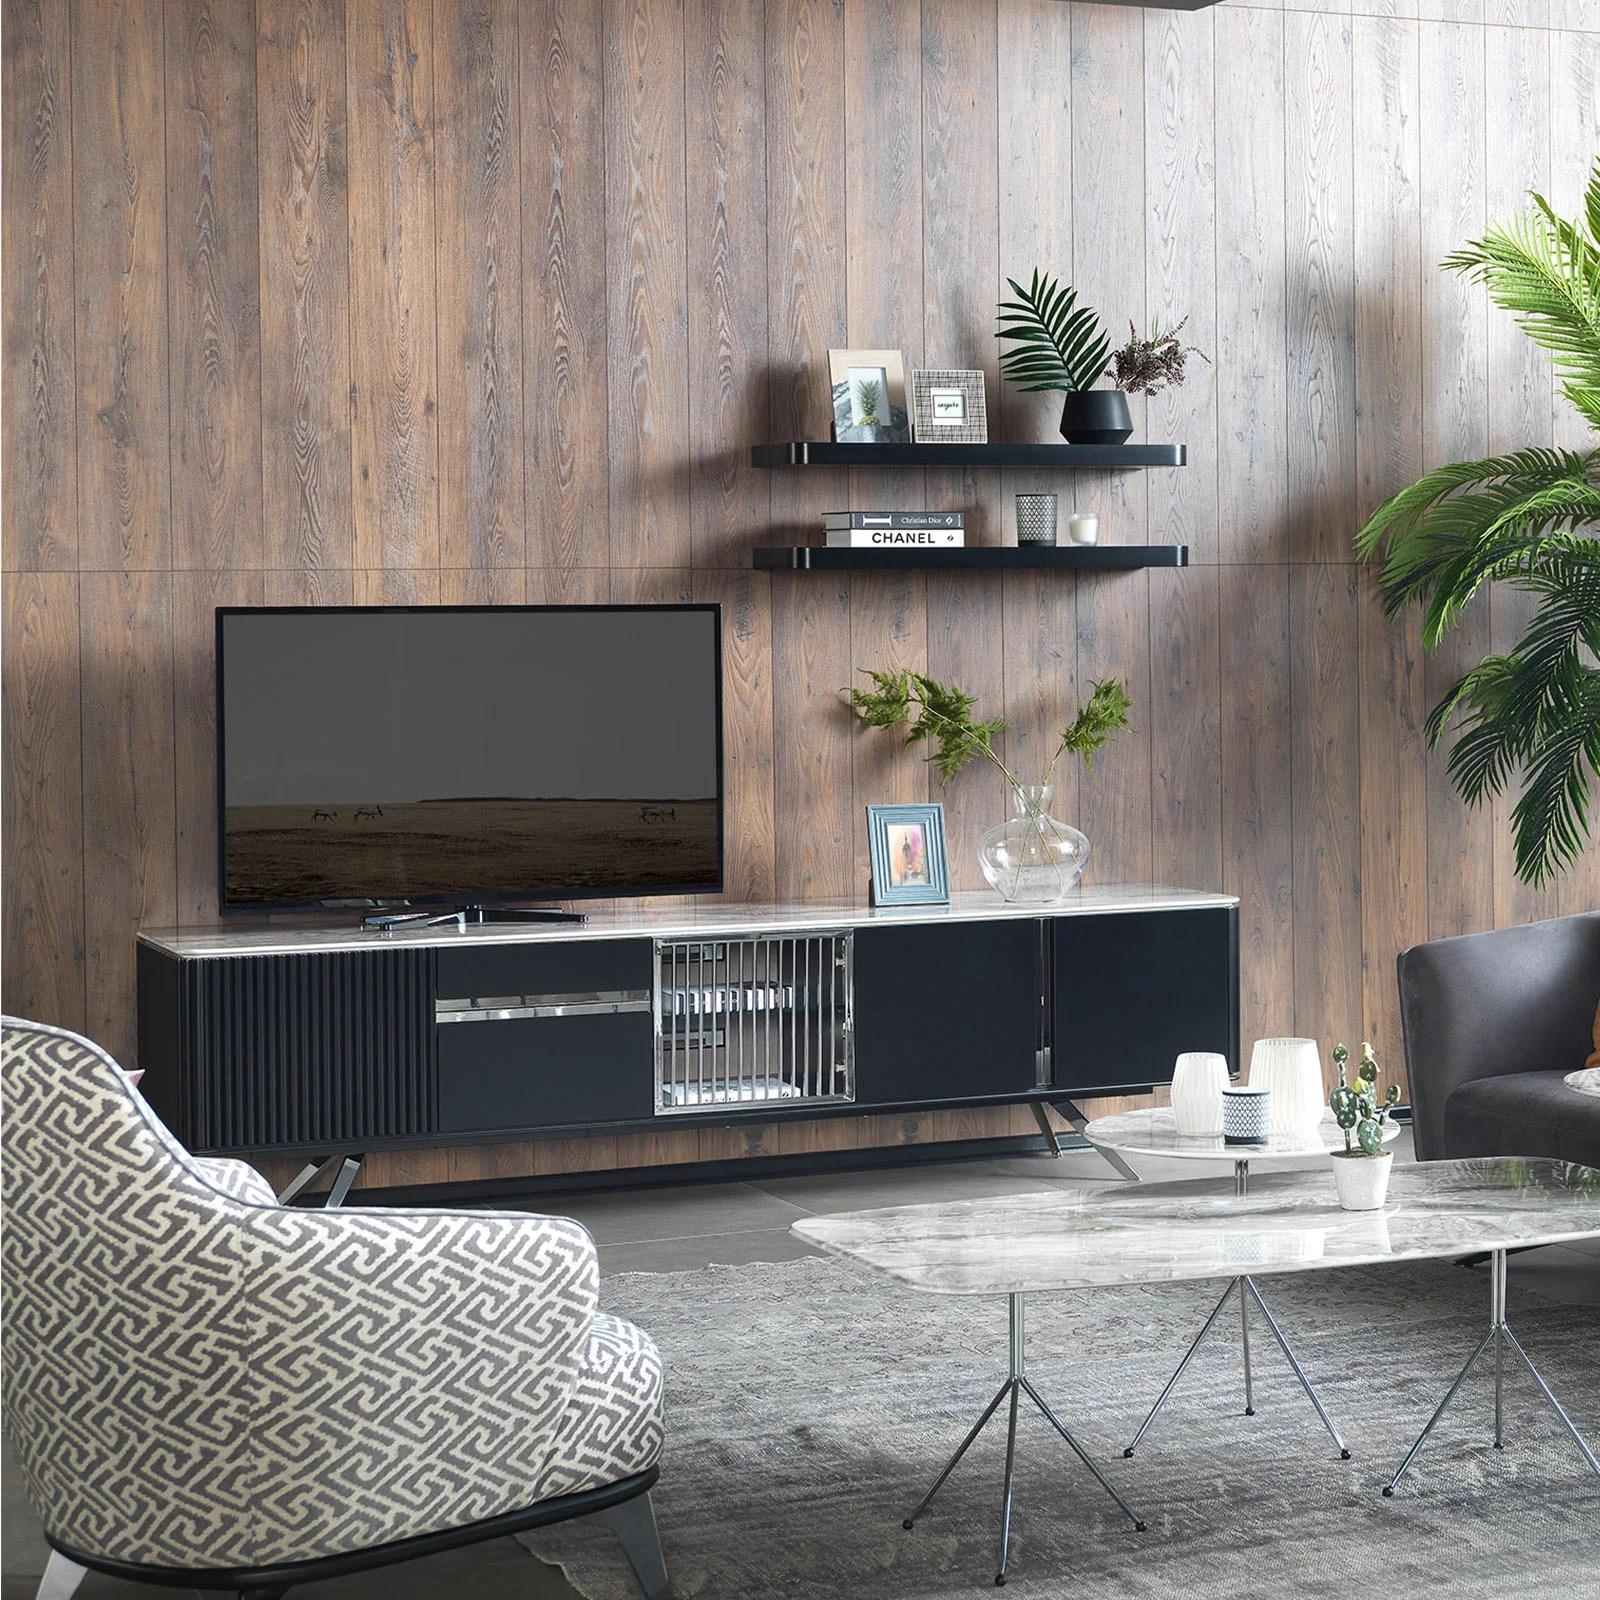 BERETTA TV unit BER00005 | Online Furniture & Home Decor UAE on Beretta Outdoor Living id=44944